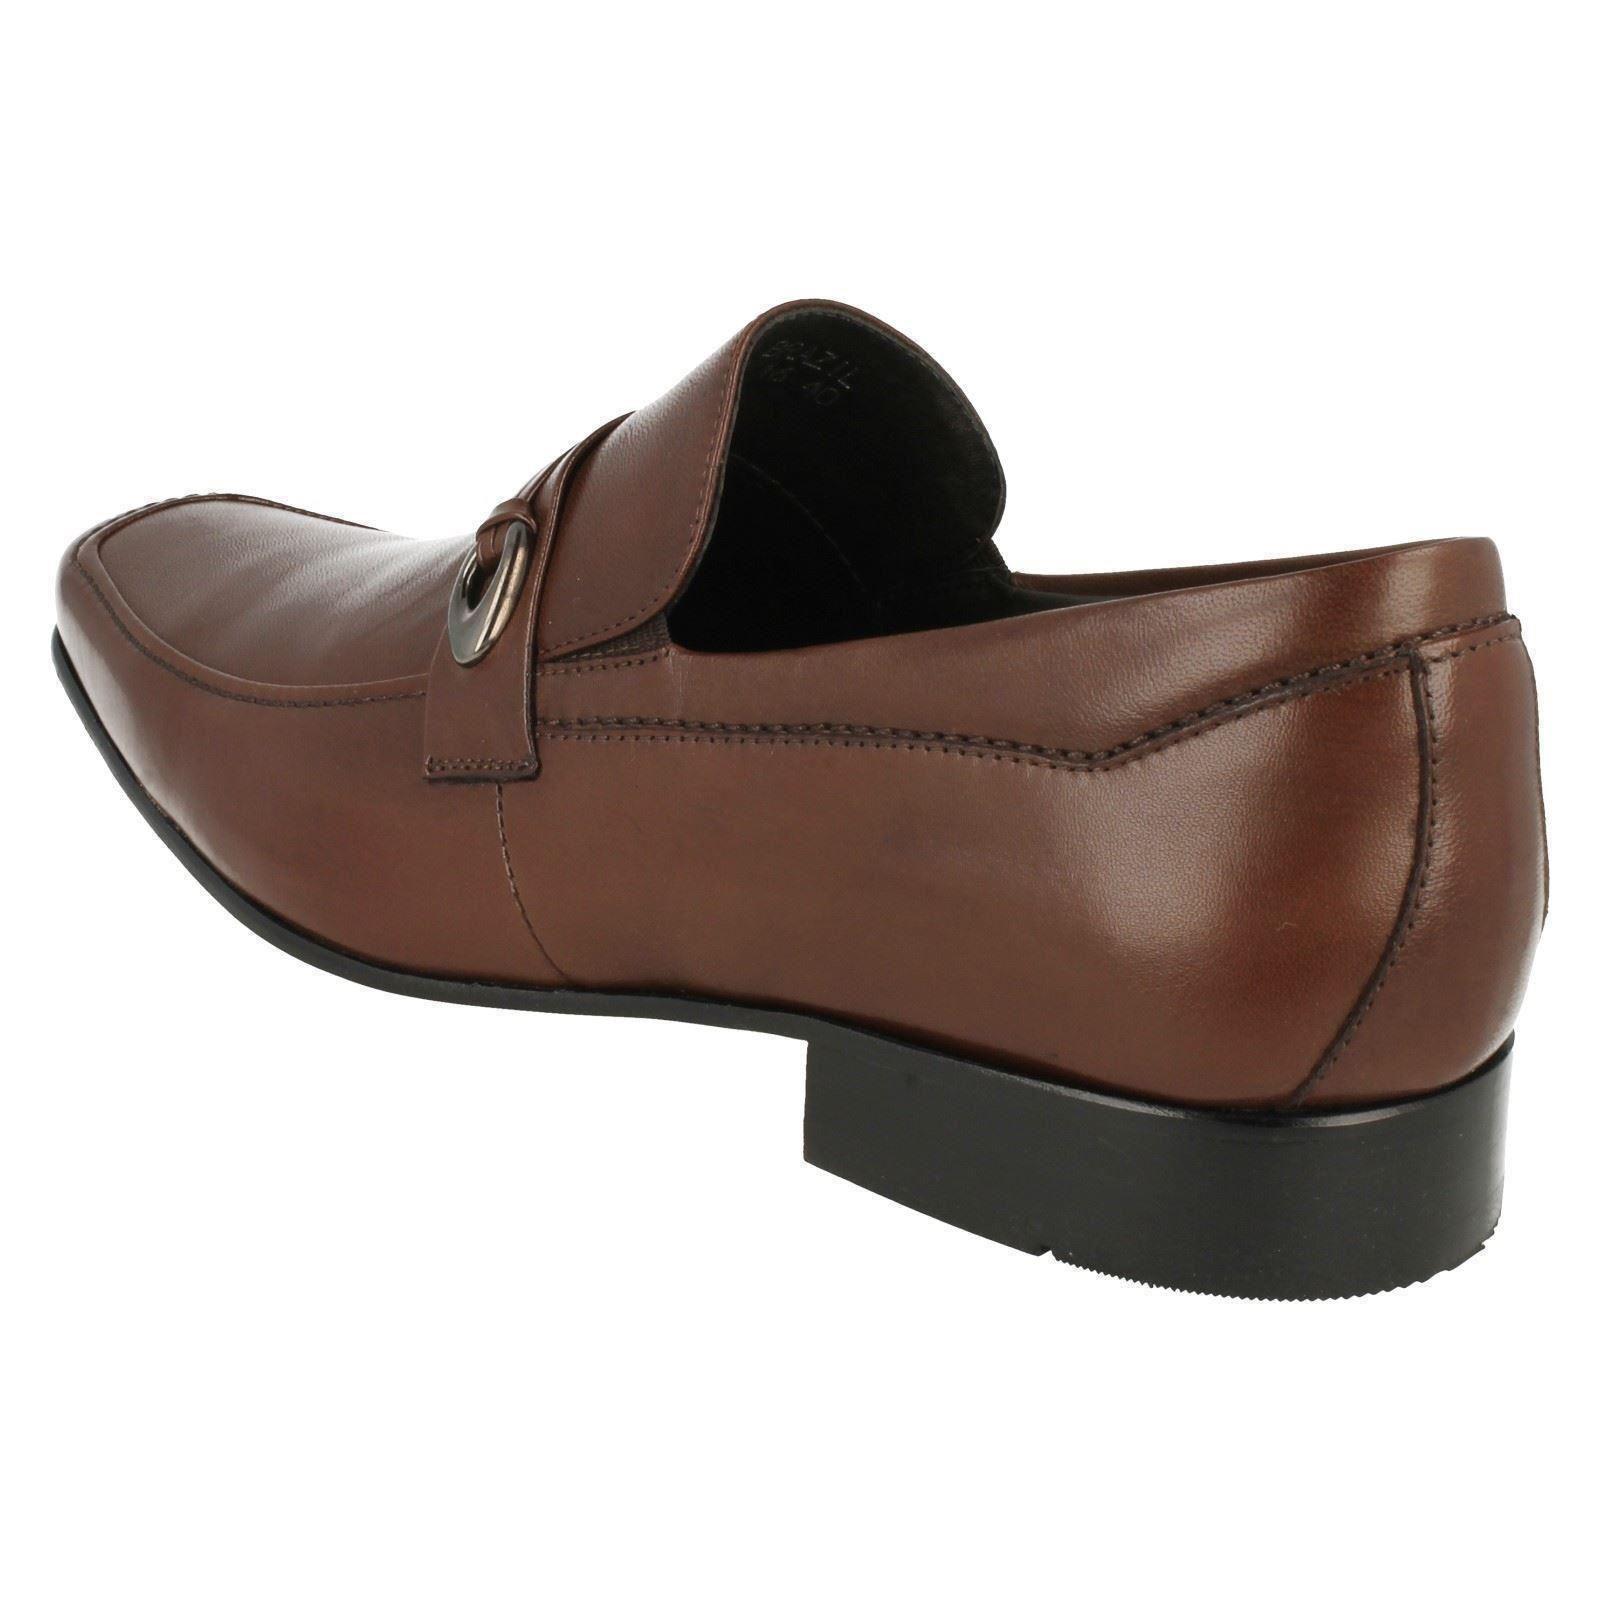 Uomo Anatomic Style Formal Slip On Schuhes Style Anatomic Goiana 2-W 10db7f